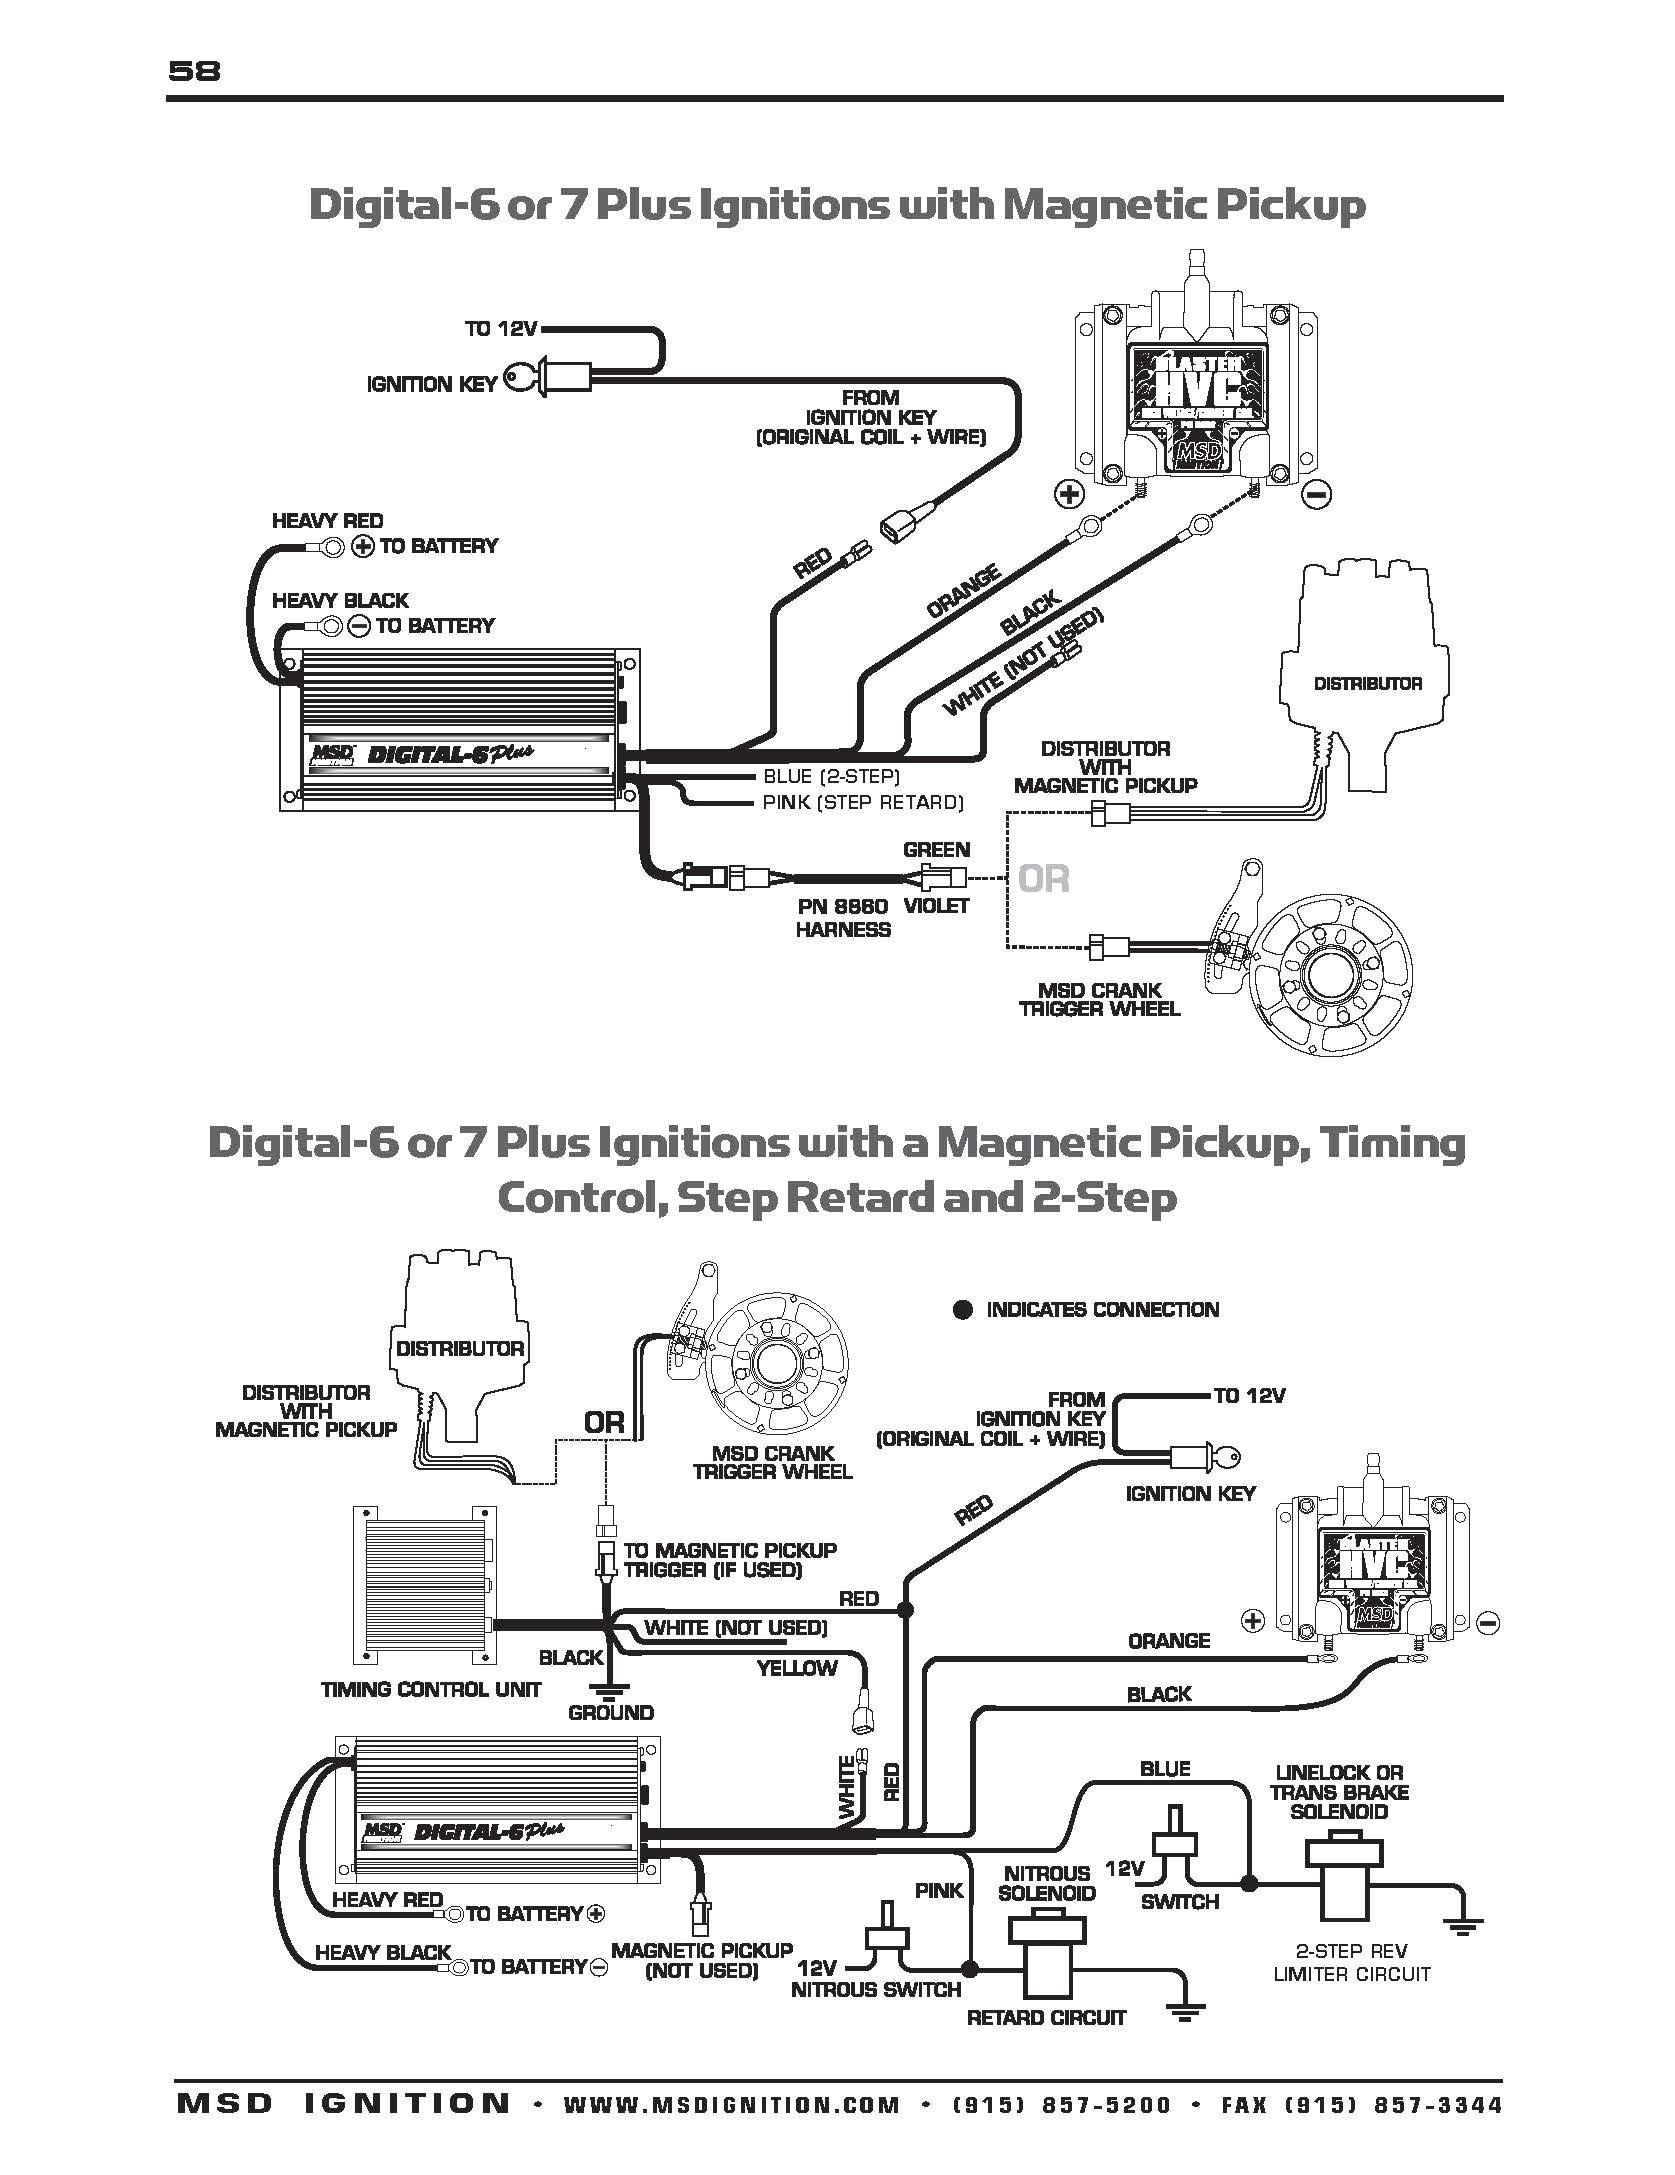 msd digital 6 plus wiring diagram wiring diagram sheet msd digital 7 7530t wiring diagram msd digital 7 wiring diagram